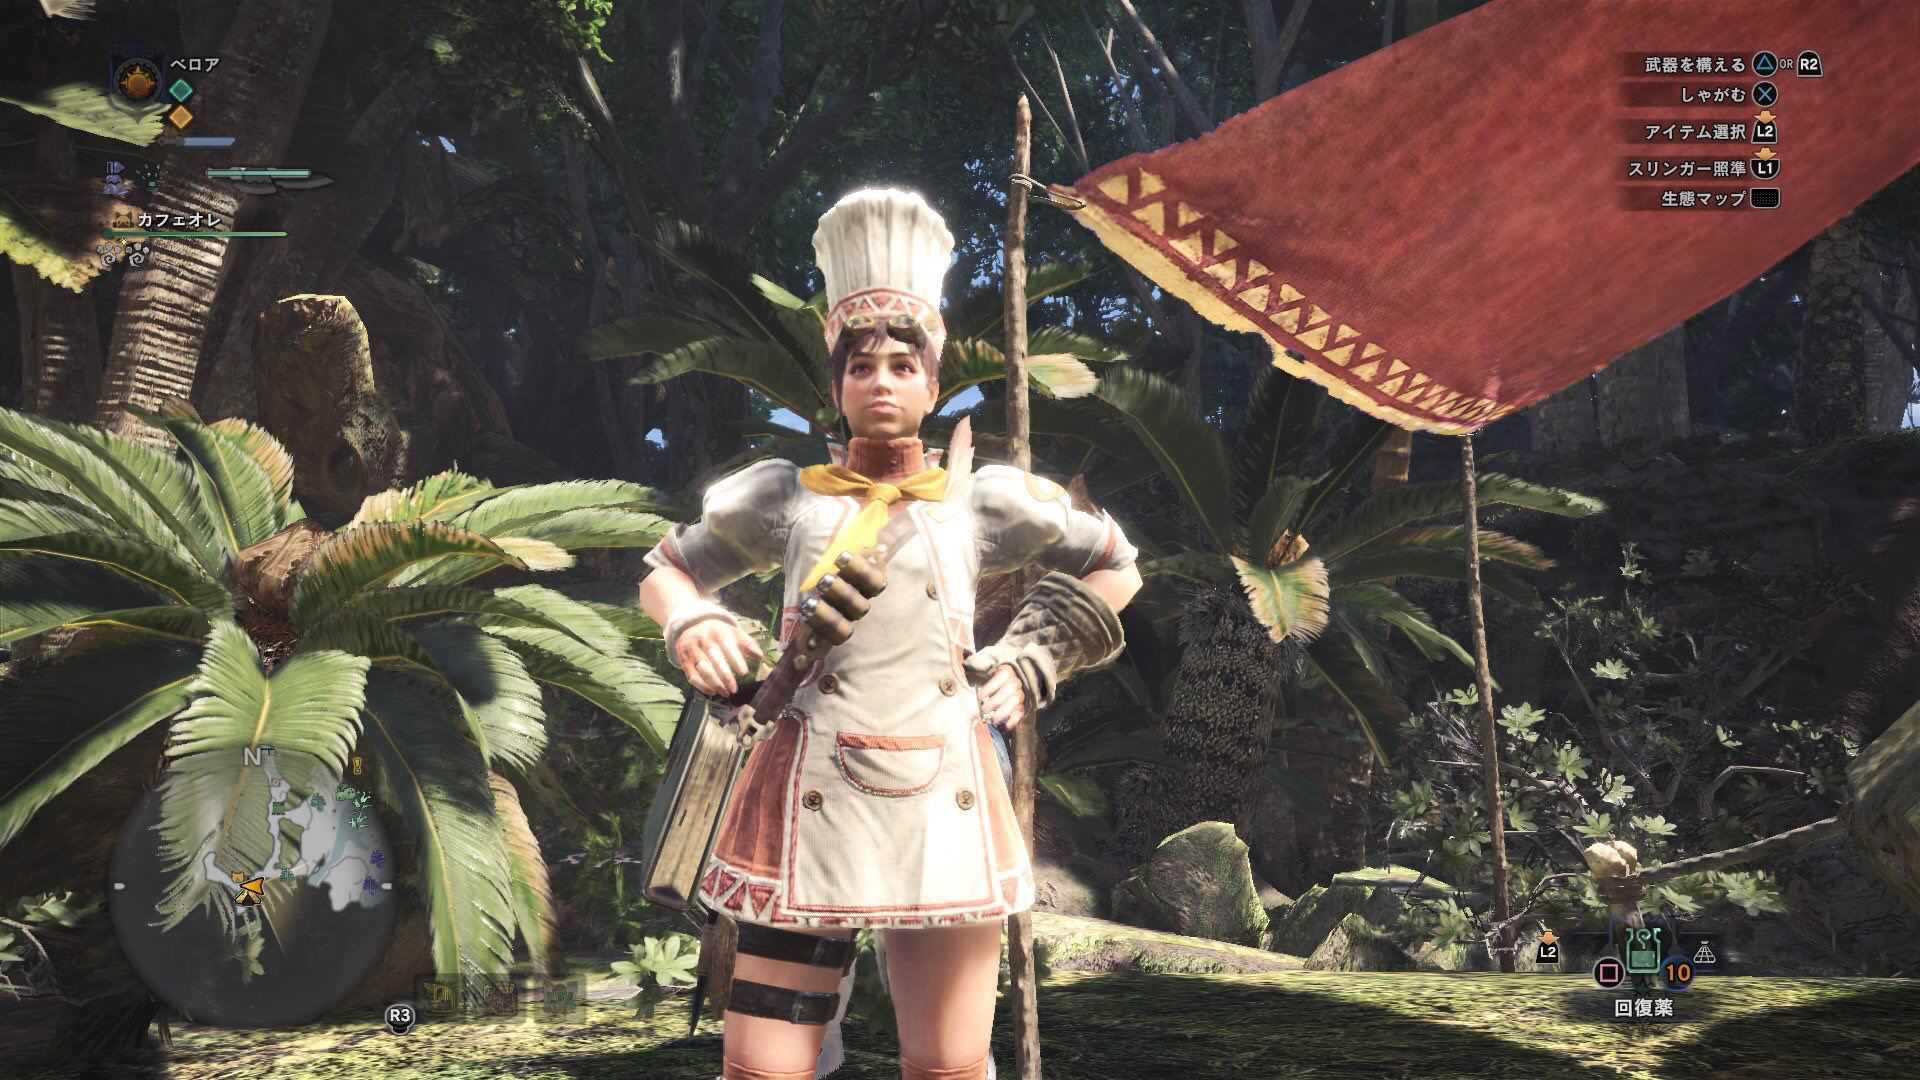 『MHWモンハンワールド攻略』受付嬢新衣装「新大陸三ツ星シェフコート」